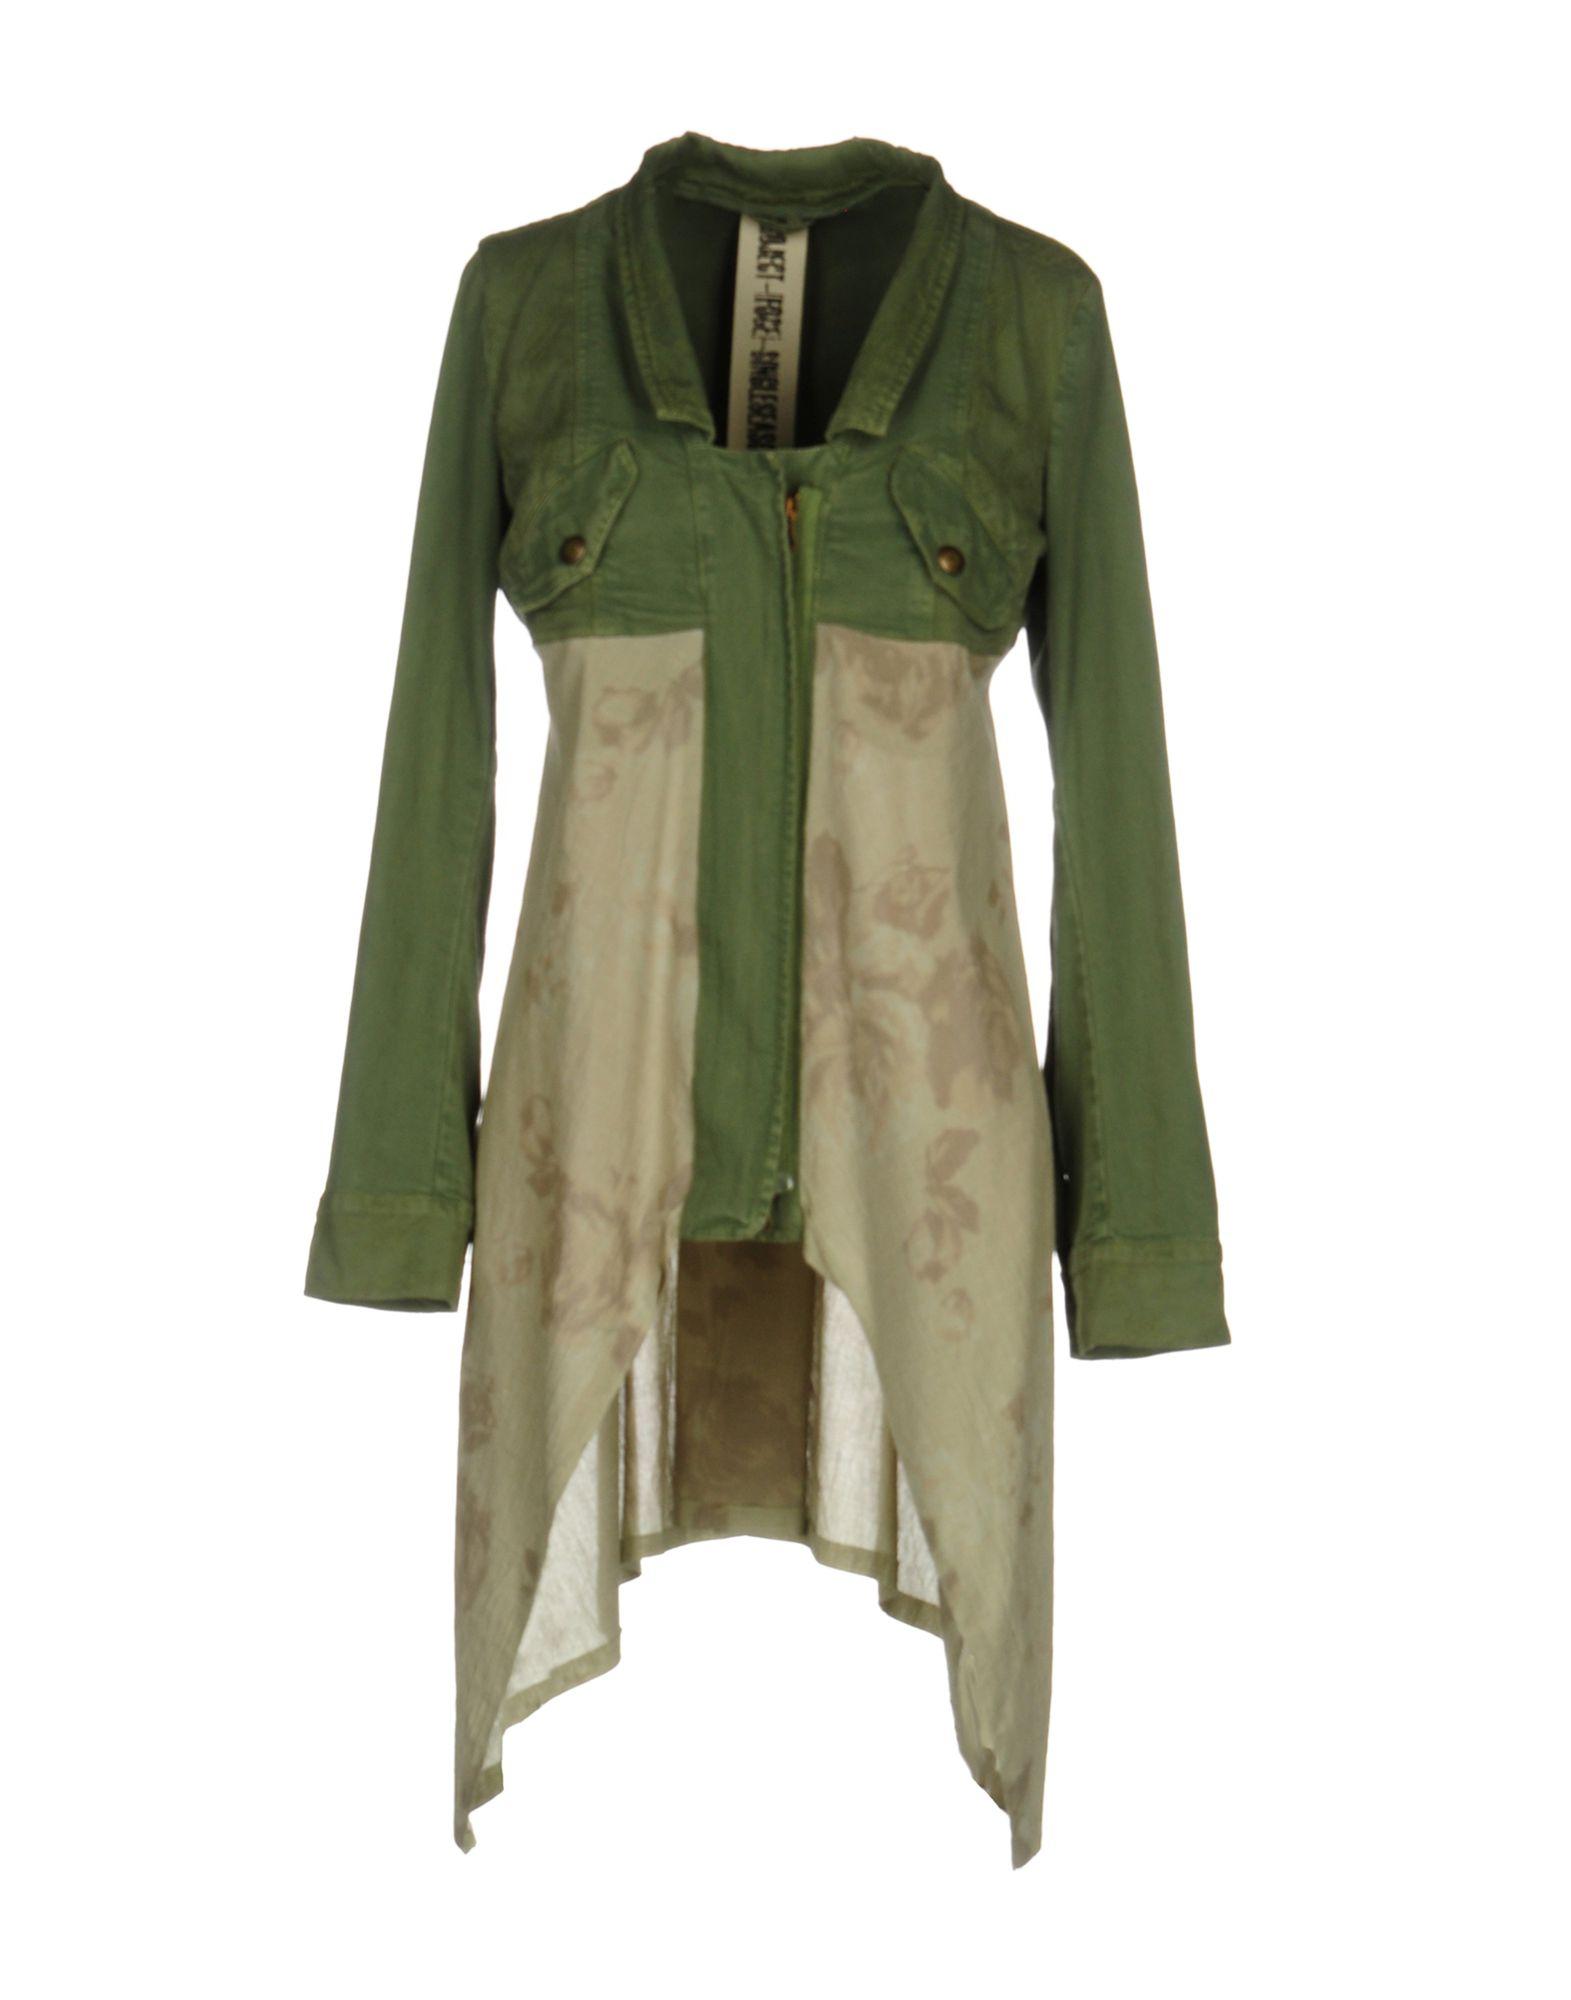 PROJECT -- [FOCE] -- SINGLESEASON -- Легкое пальто project [foce] singleseason пиджак